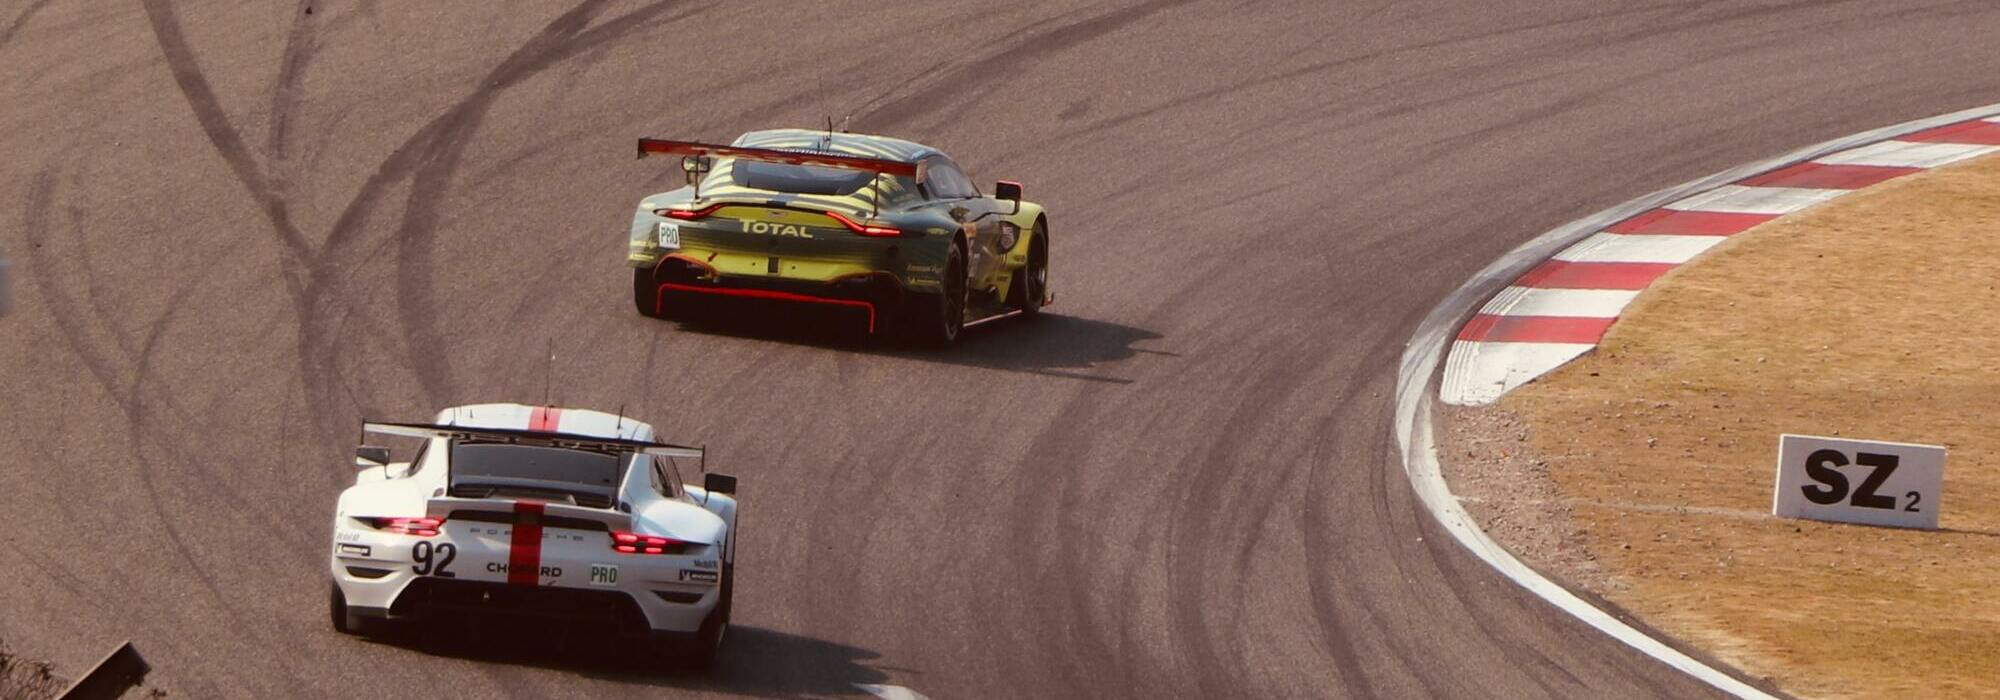 A NHRA Lucas Oil Drag Racing Series live event